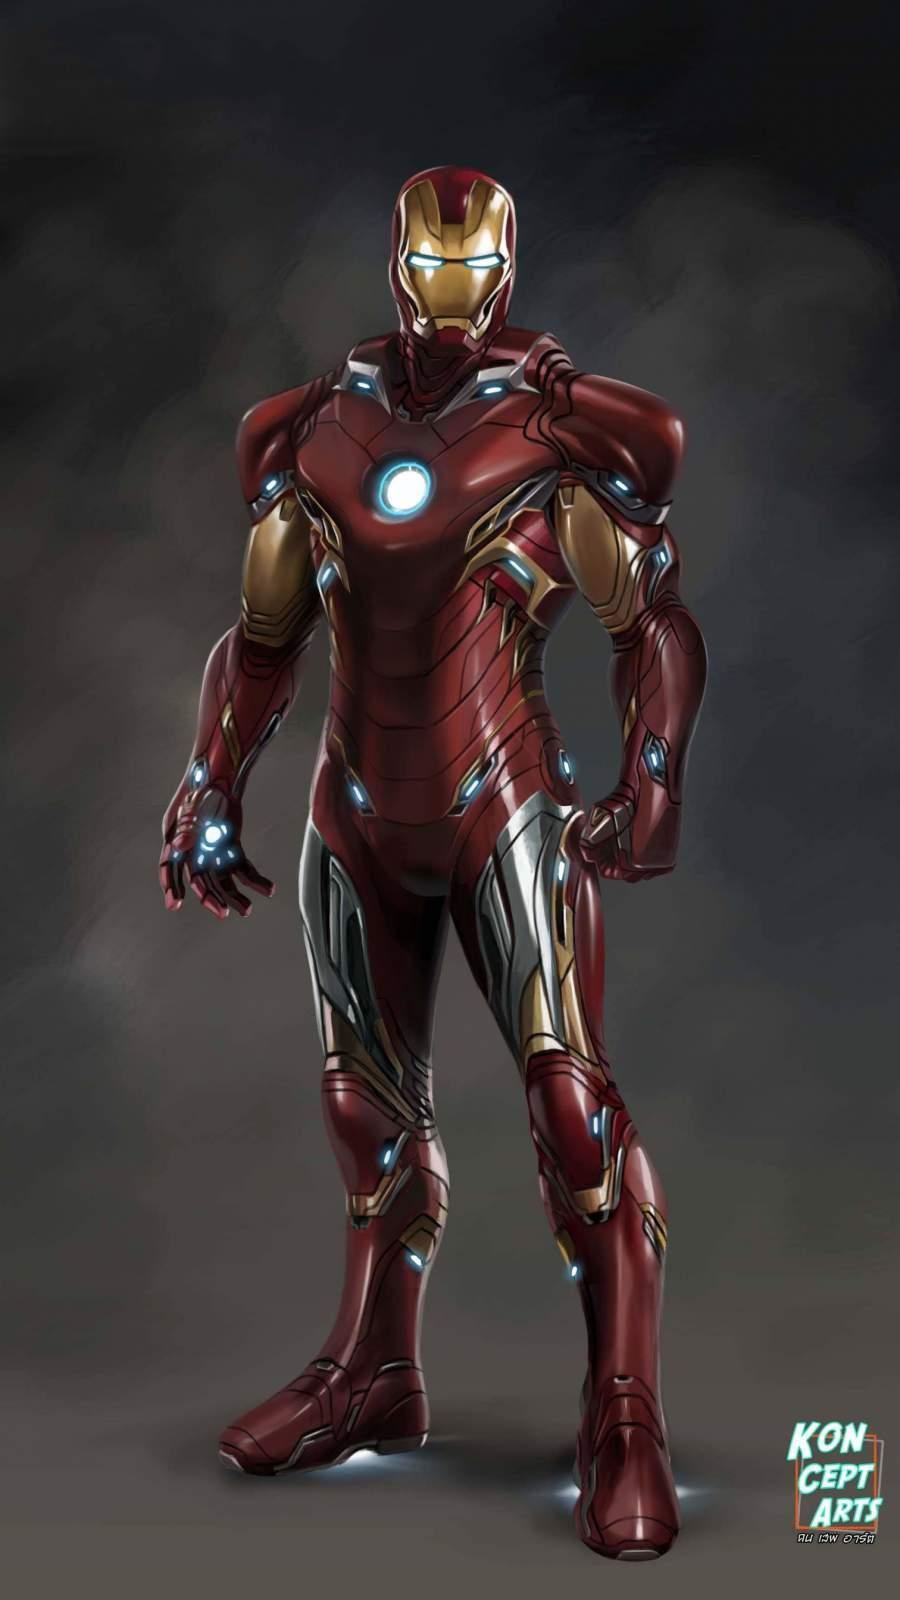 The Iron Man MK 85 Armor iPhone Wallpaper